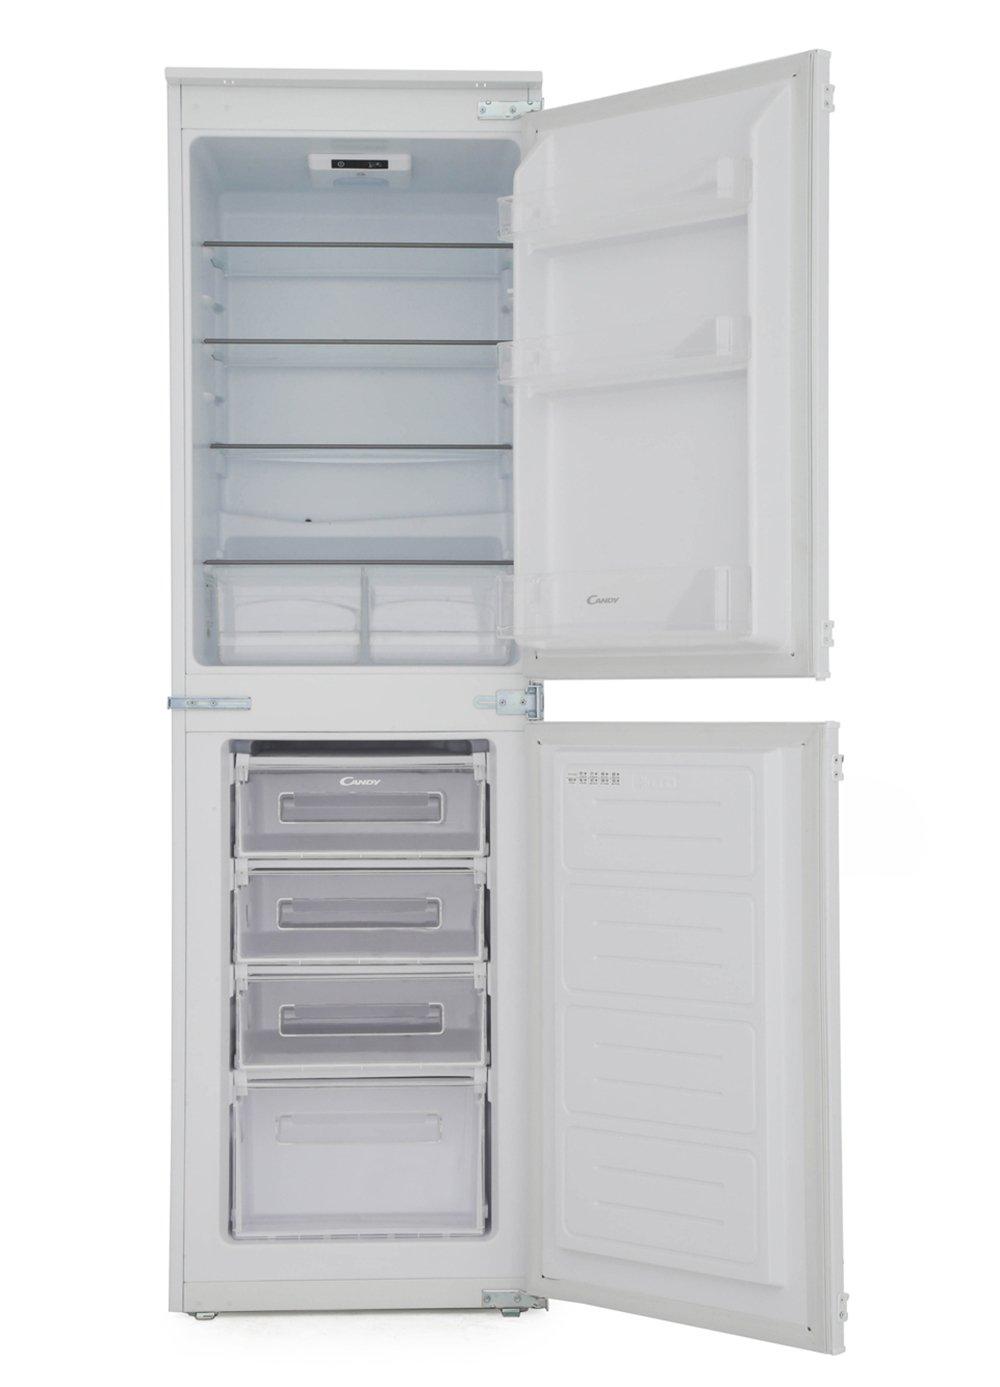 Candy BCBS 50 NUK Static Integrated Fridge Freezer